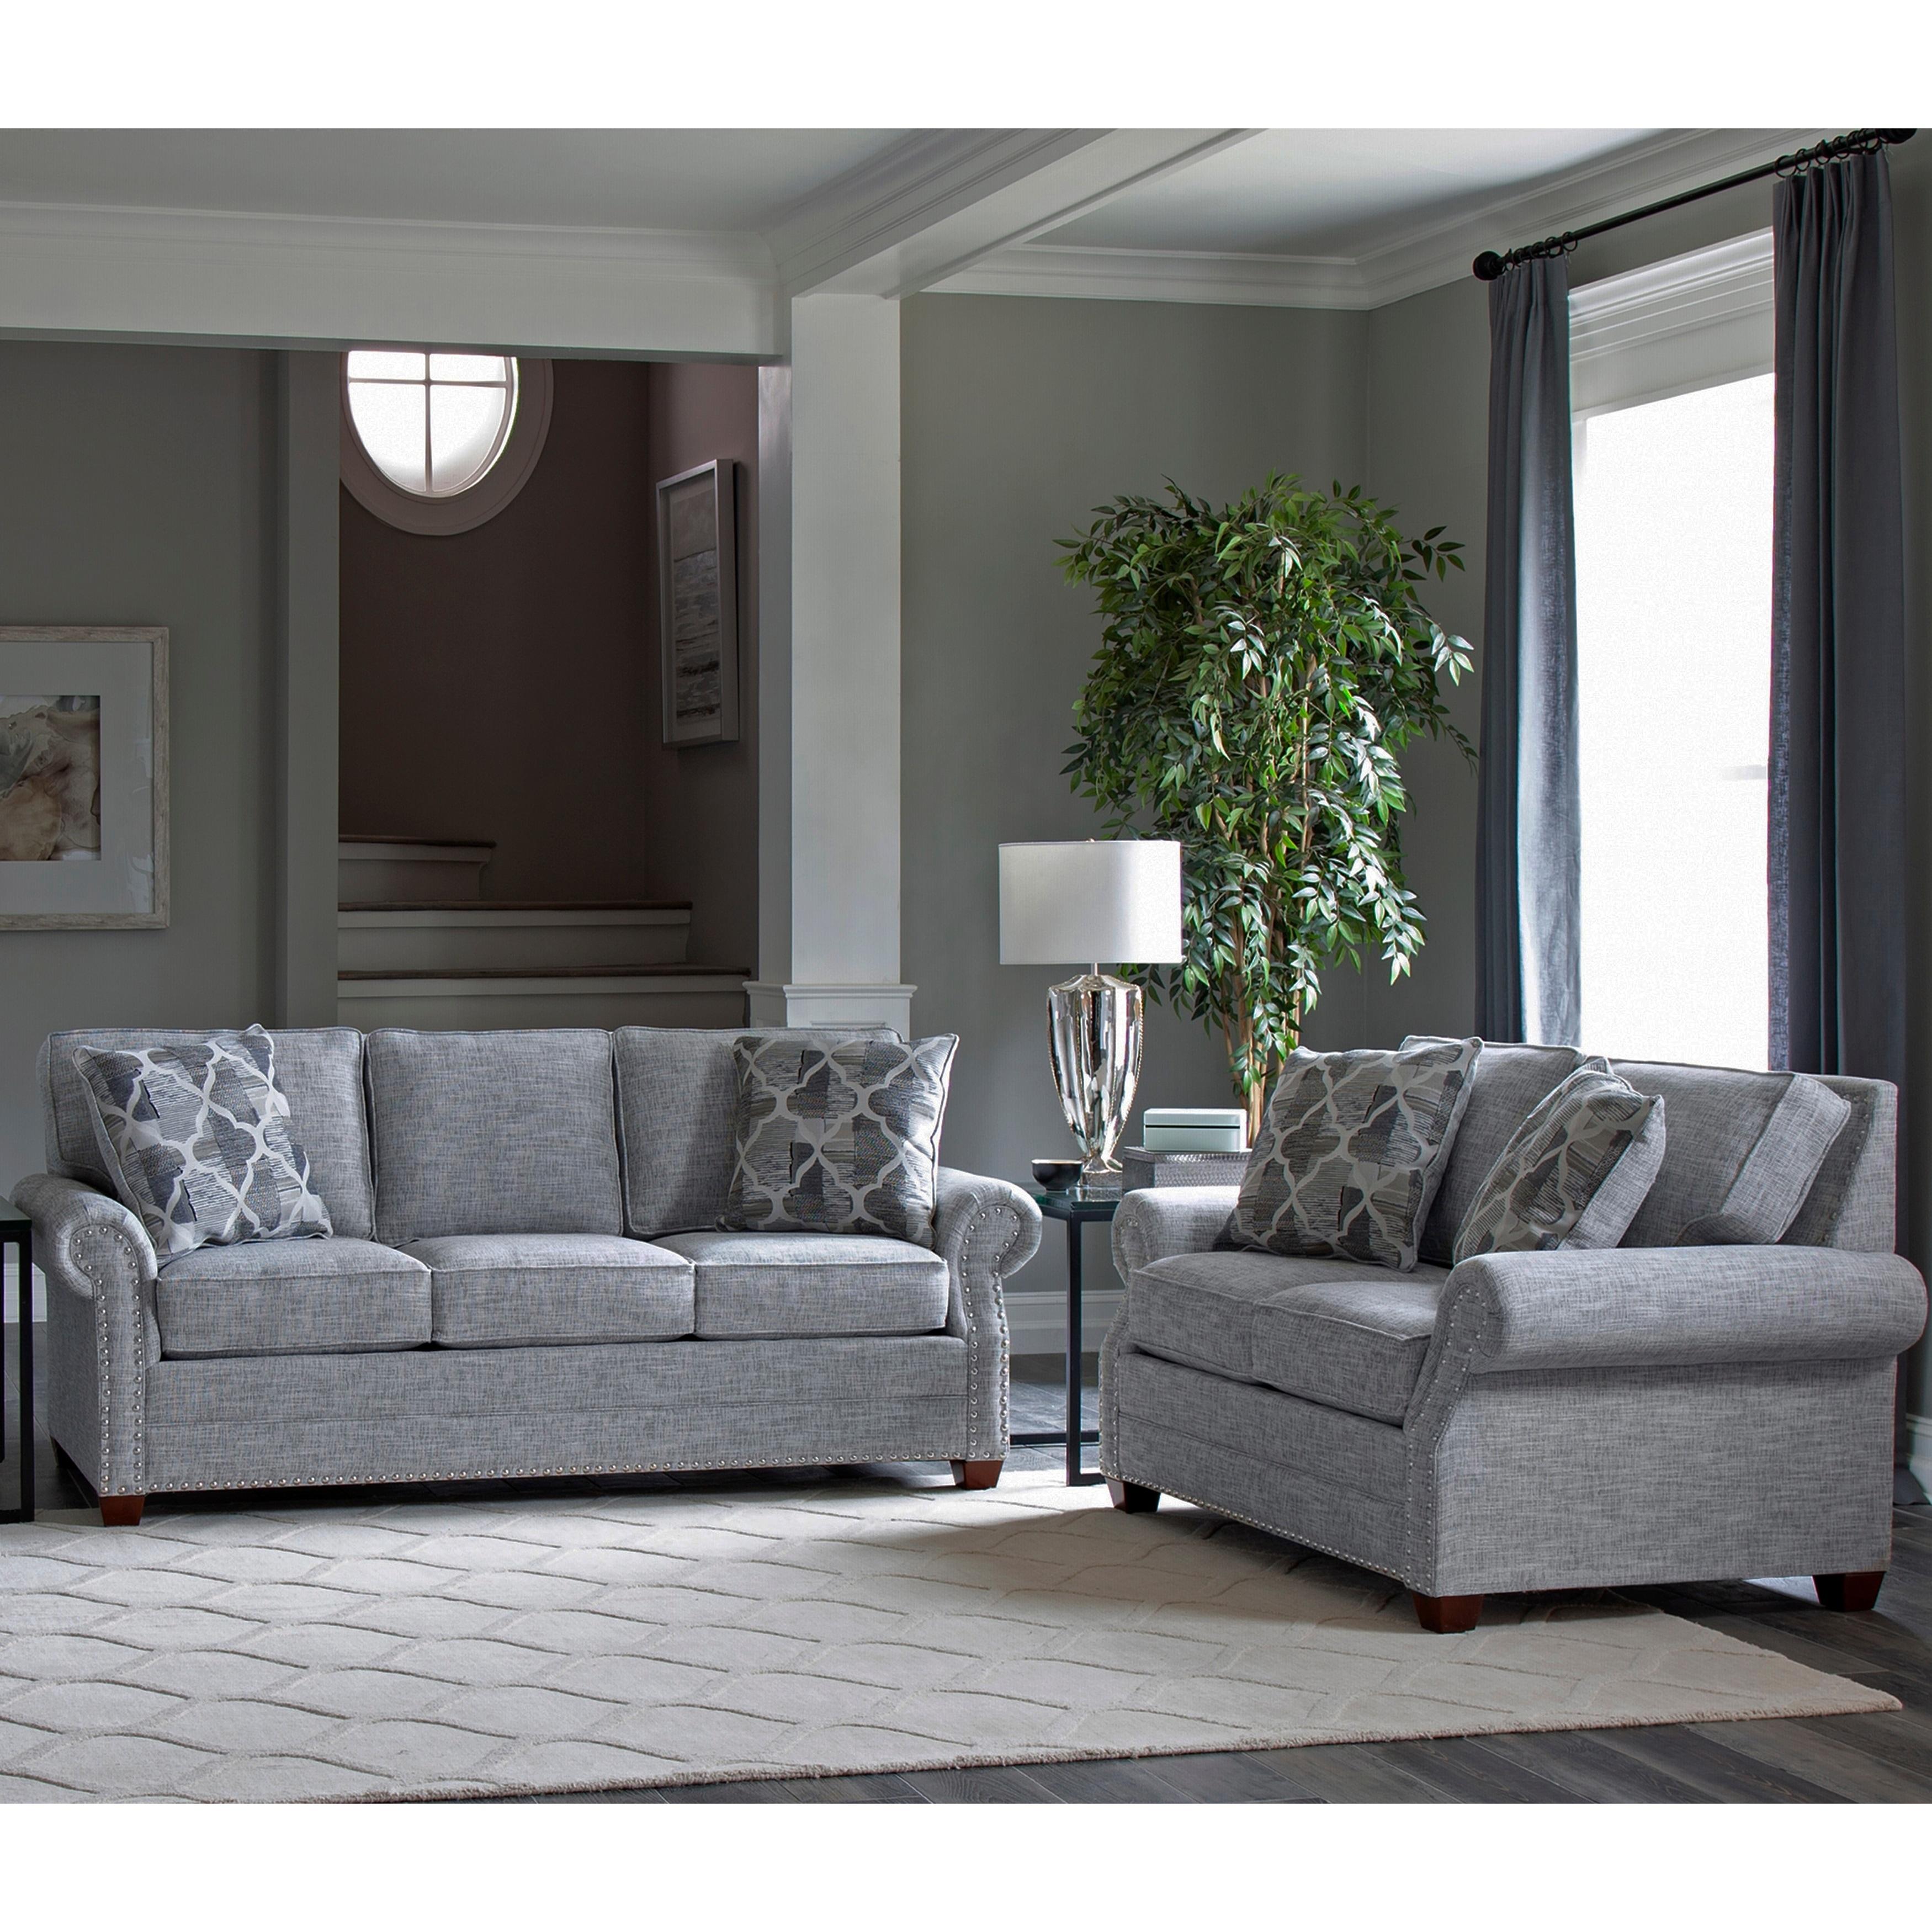 Usa Marner Grey Fabric Sofa